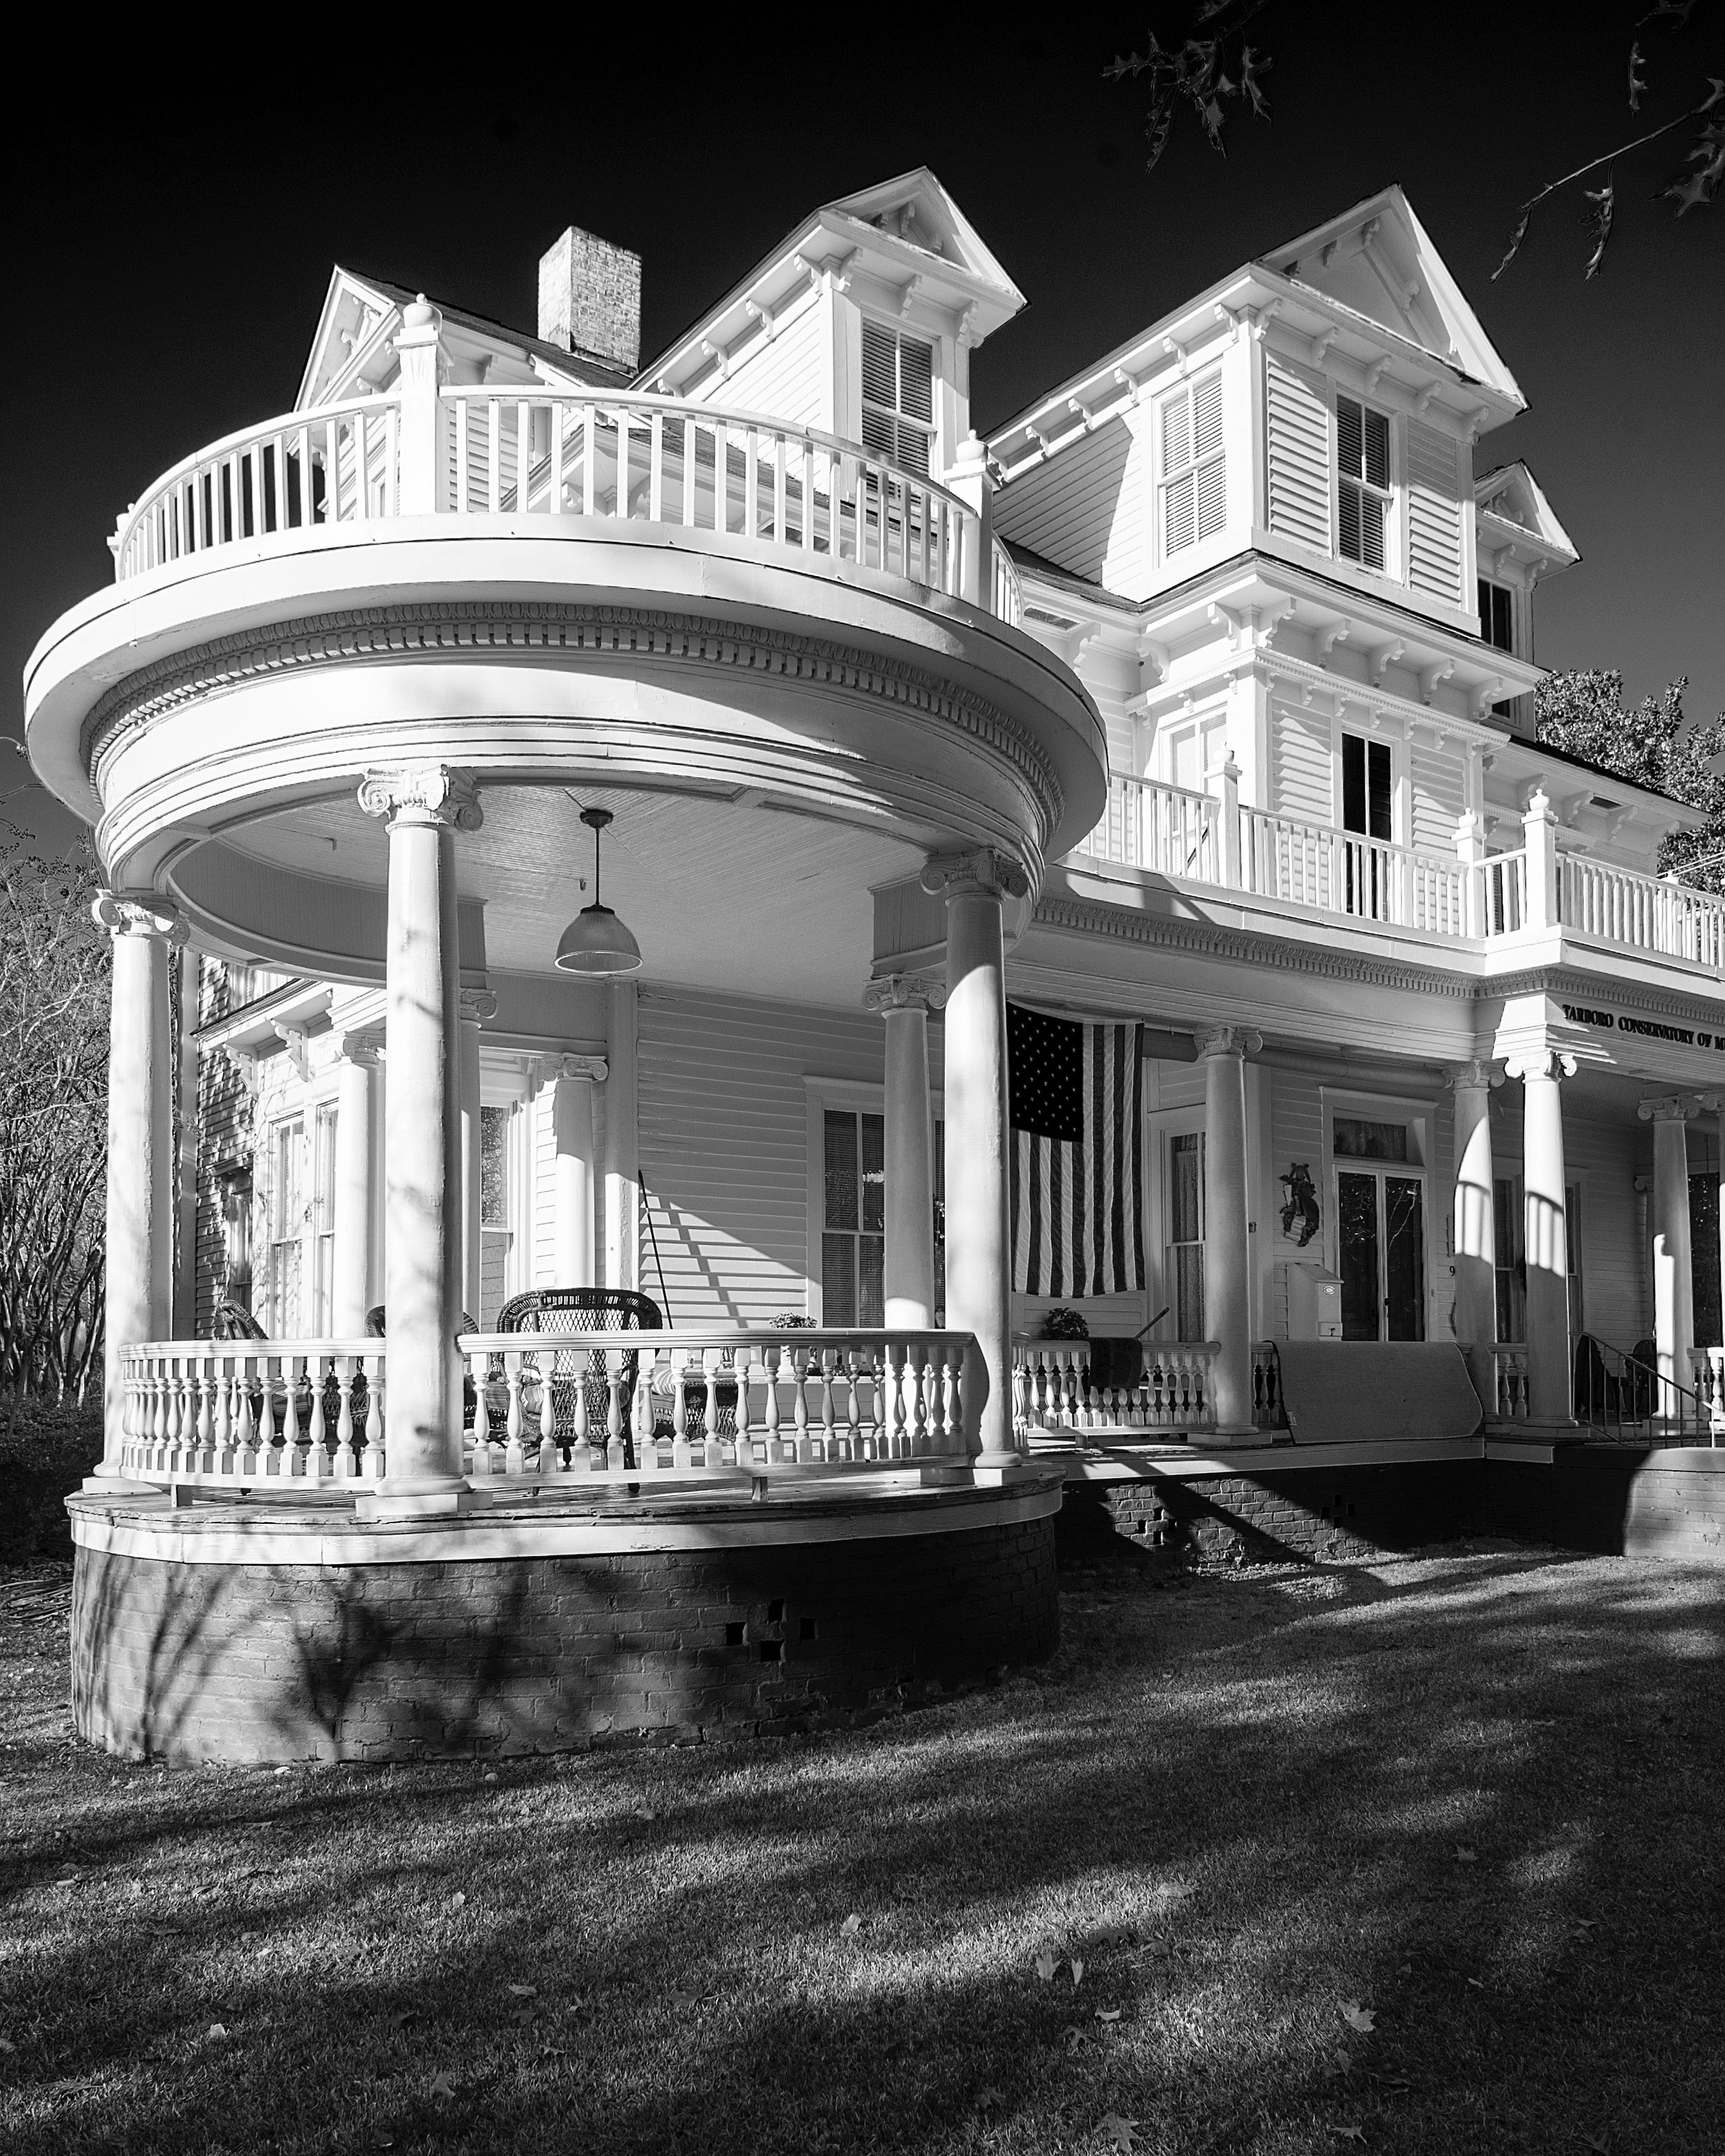 Wonderful Porch!